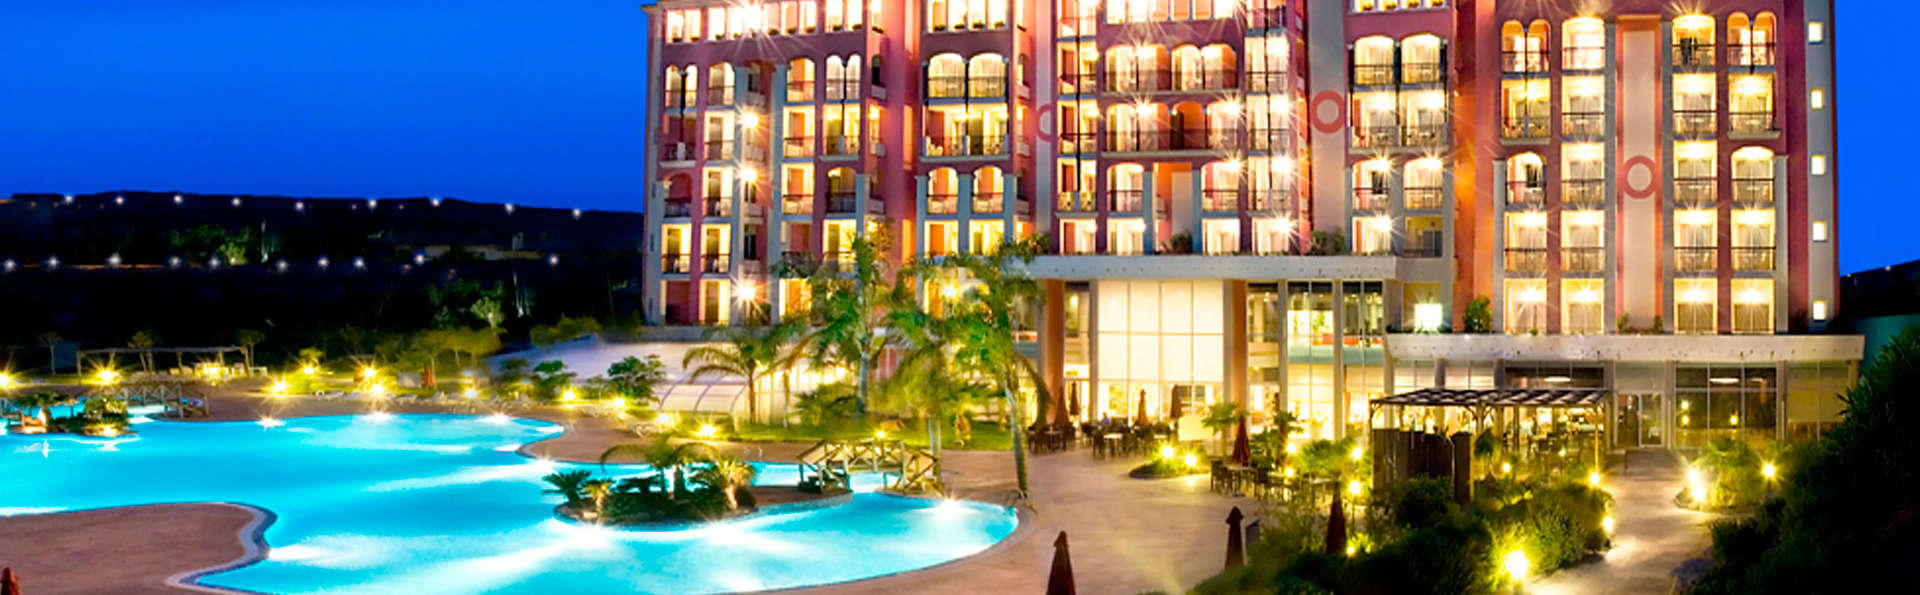 Hotel Bonalba Alicante - edit_front3121.jpg